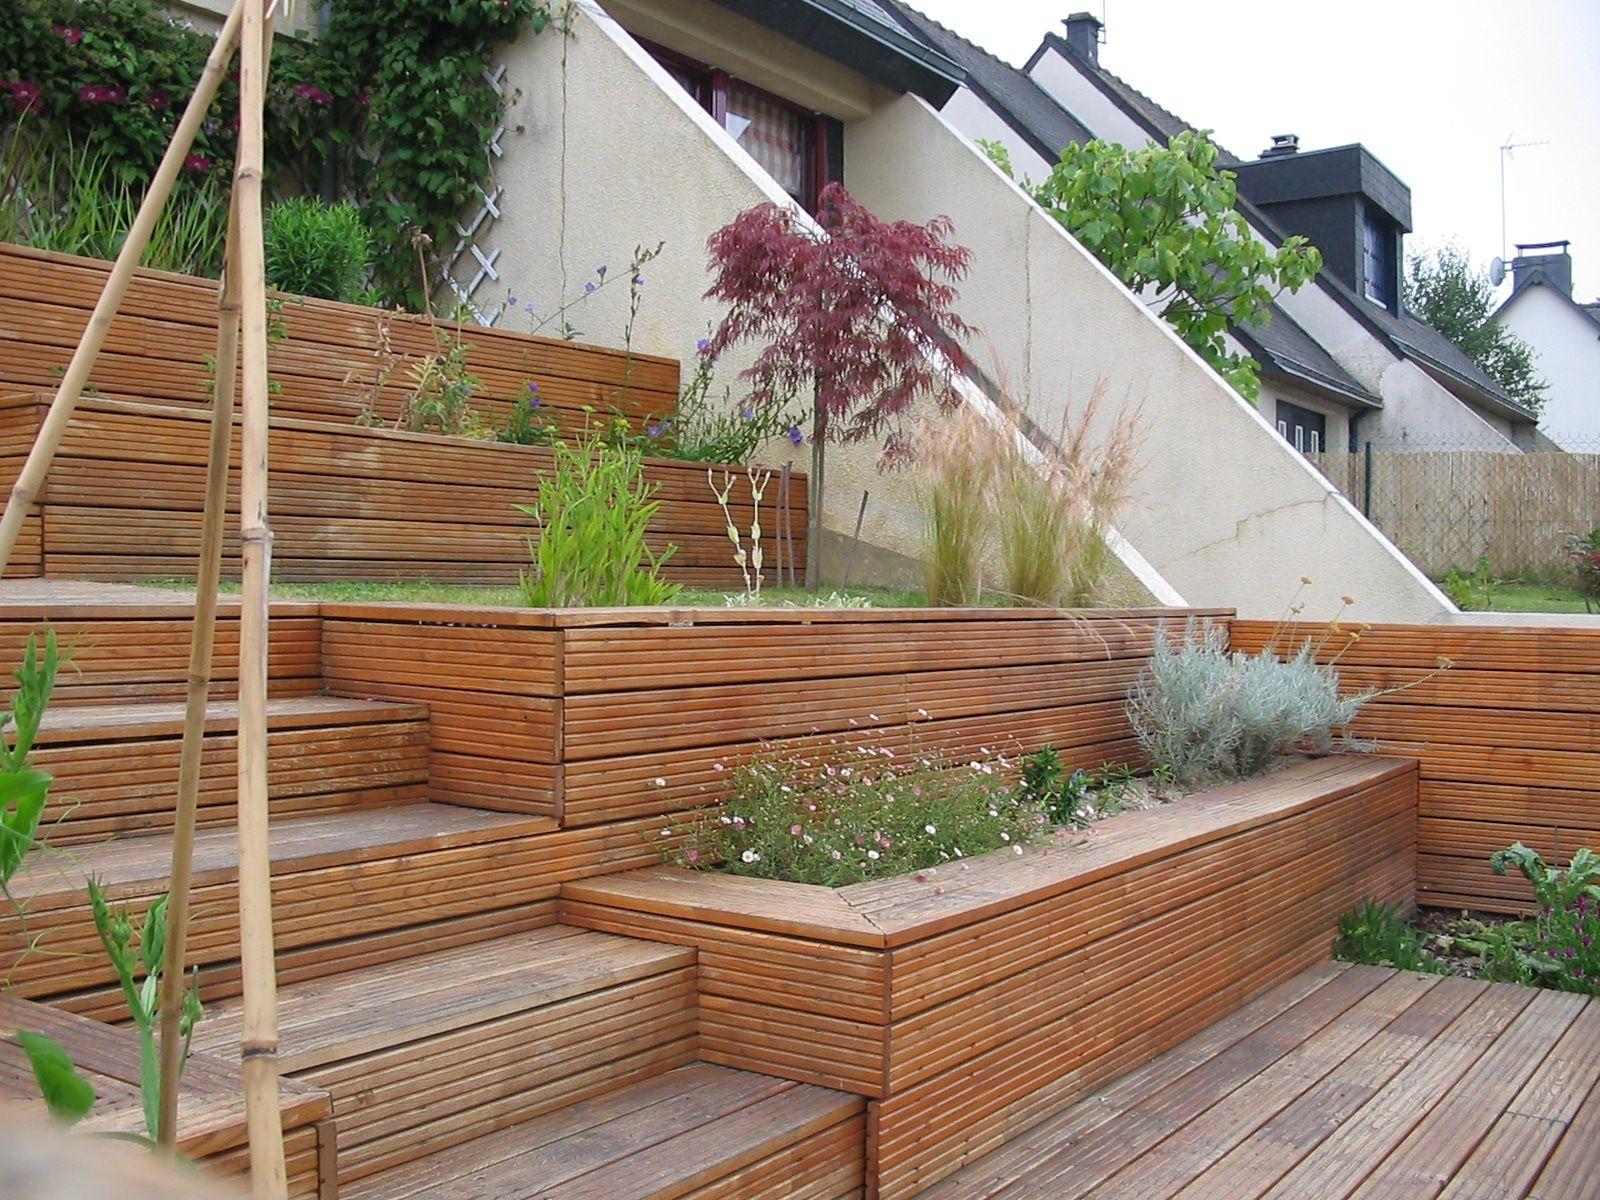 terrasse en bois  Recherche Google  exterieur  ~ Terrase En Bois